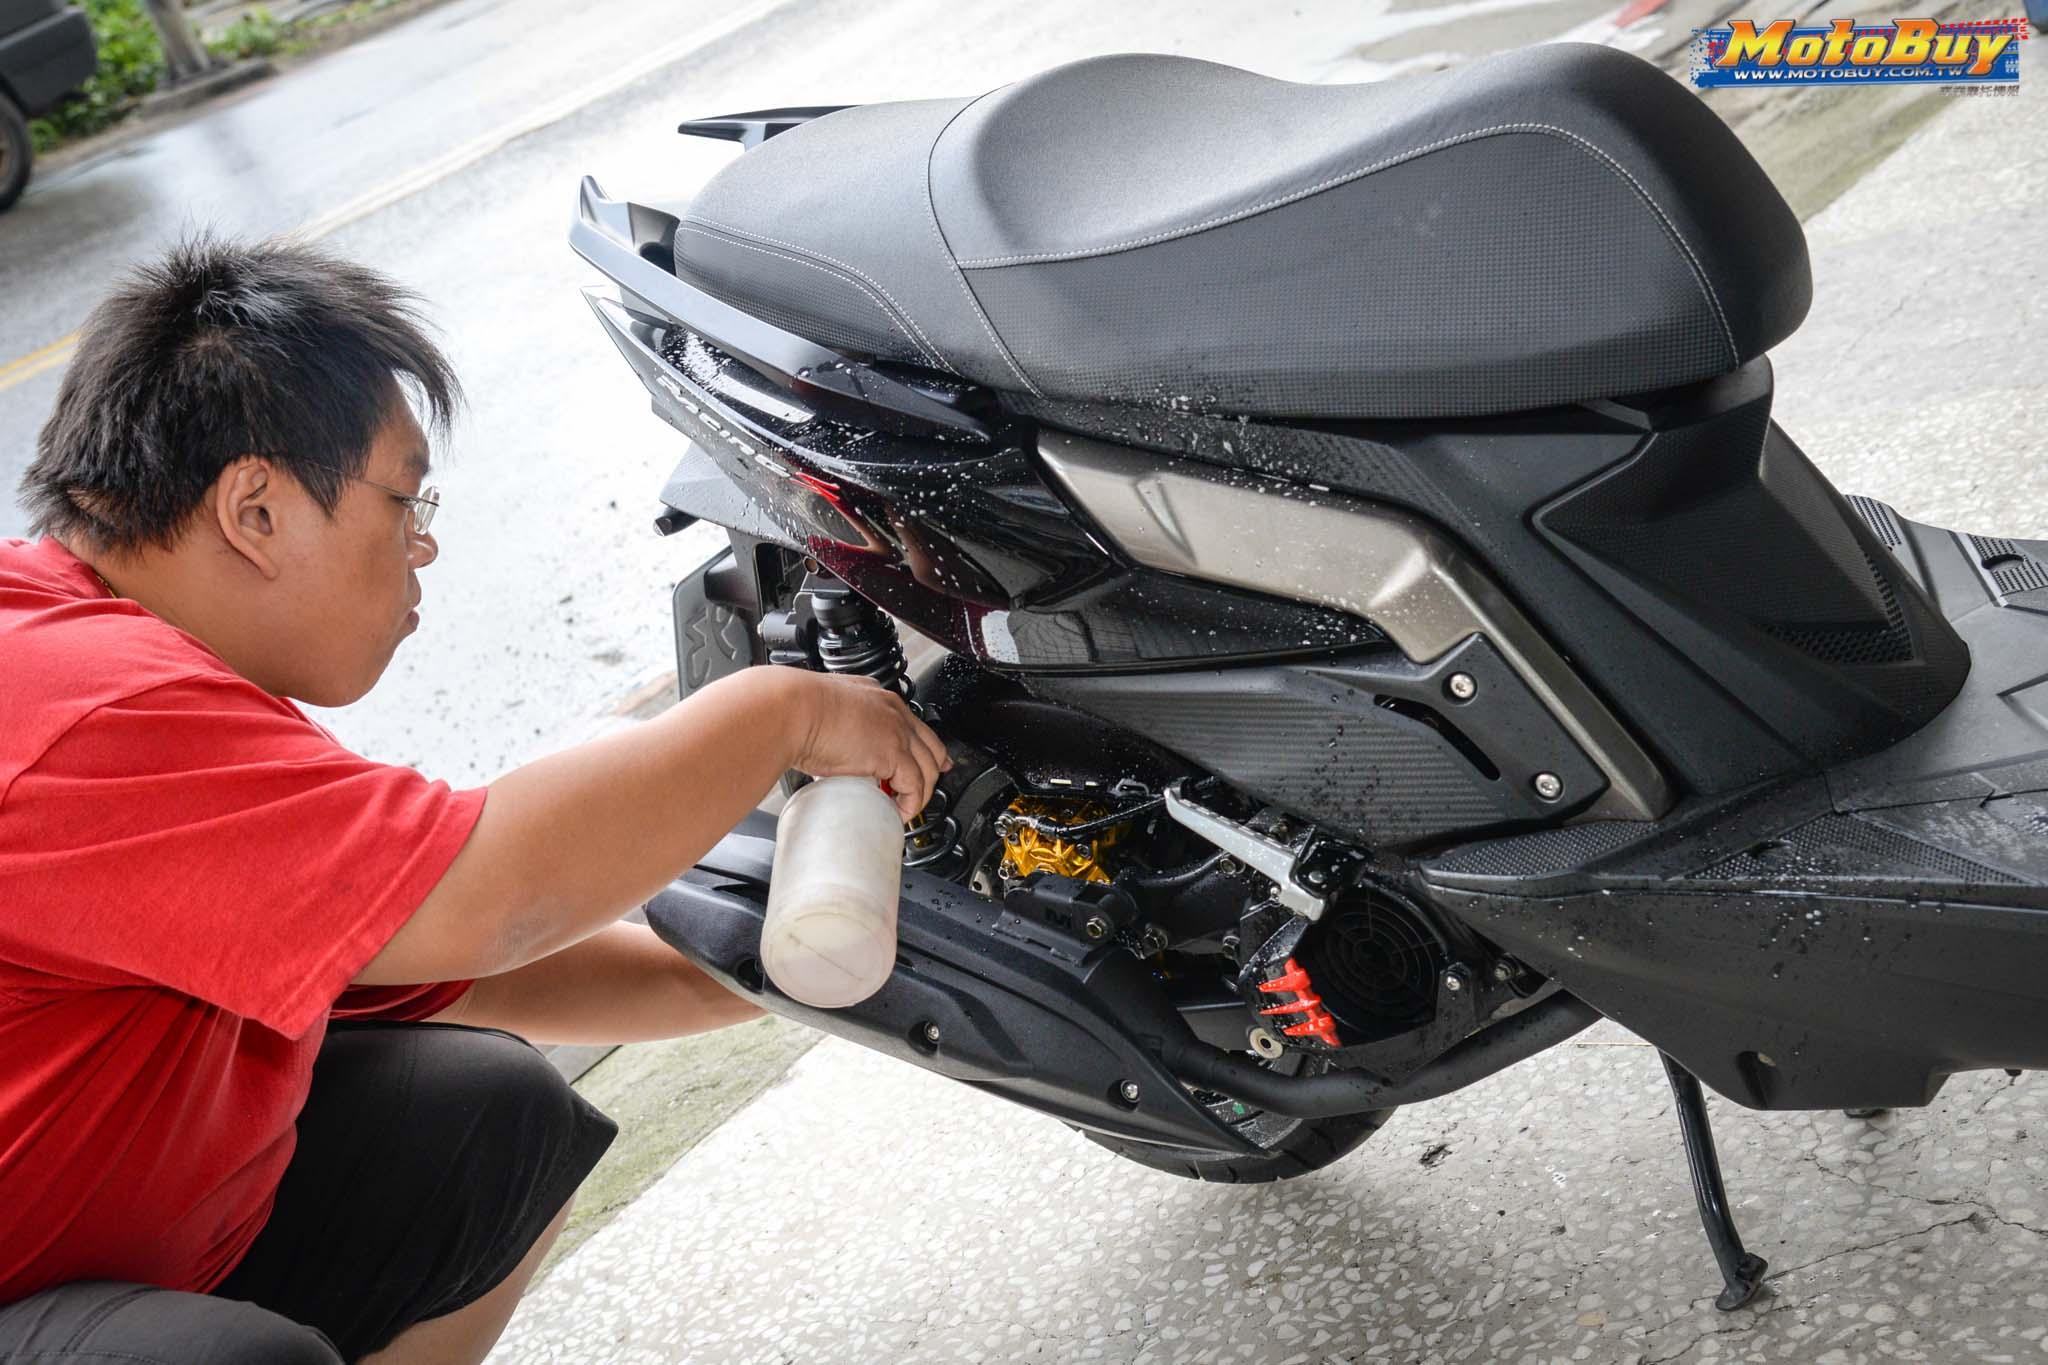 [DIY分享] 如何自助洗車!?達人解說!- PCB車輛美容 x RacingS | MotoBuy